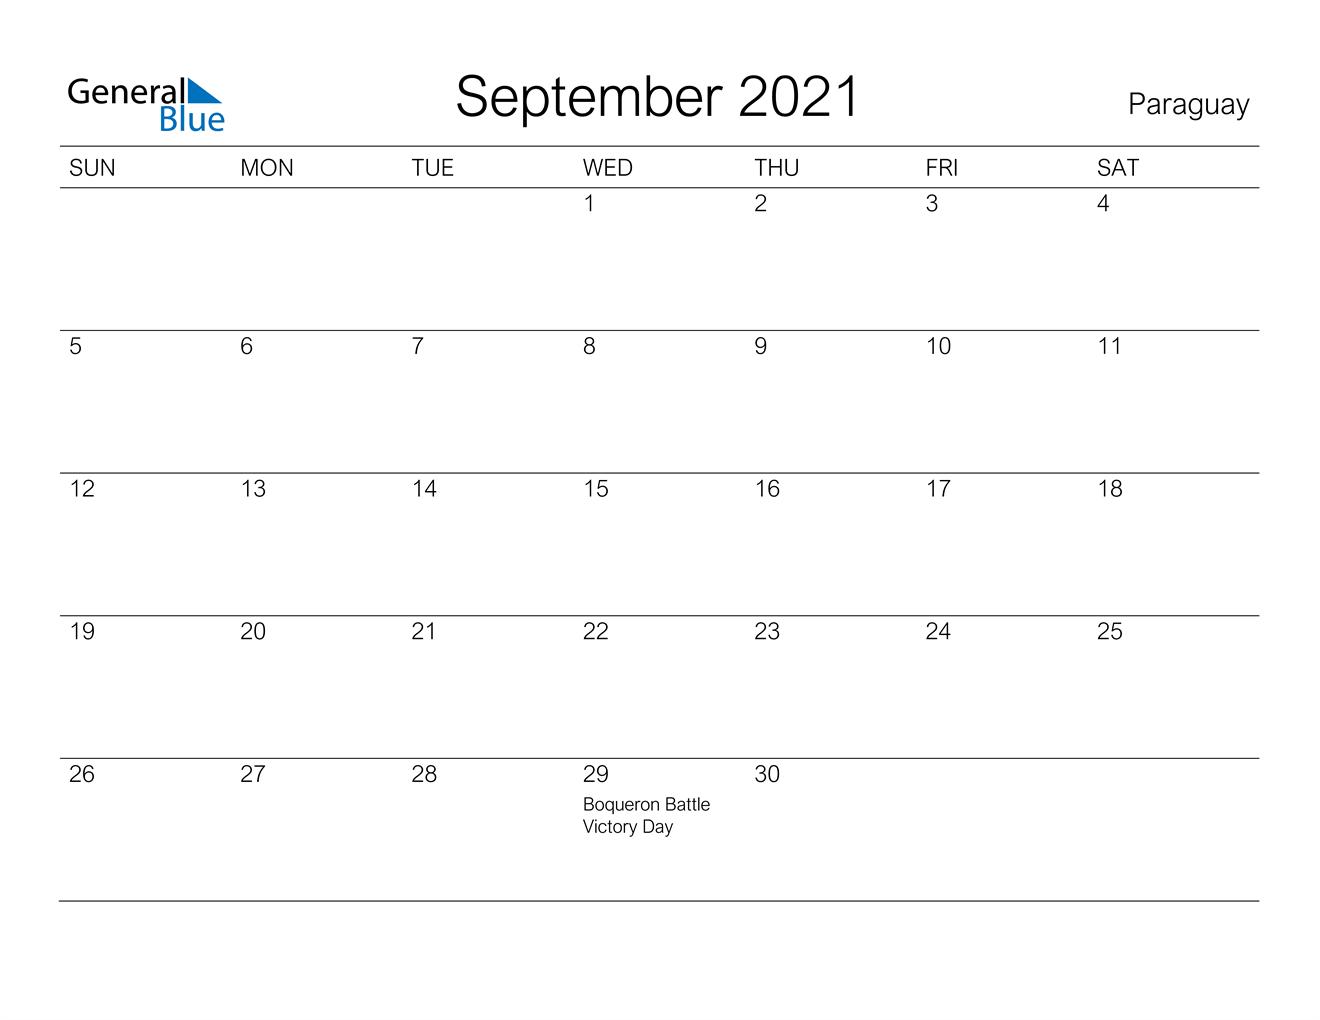 September 2021 Calendar - Paraguay